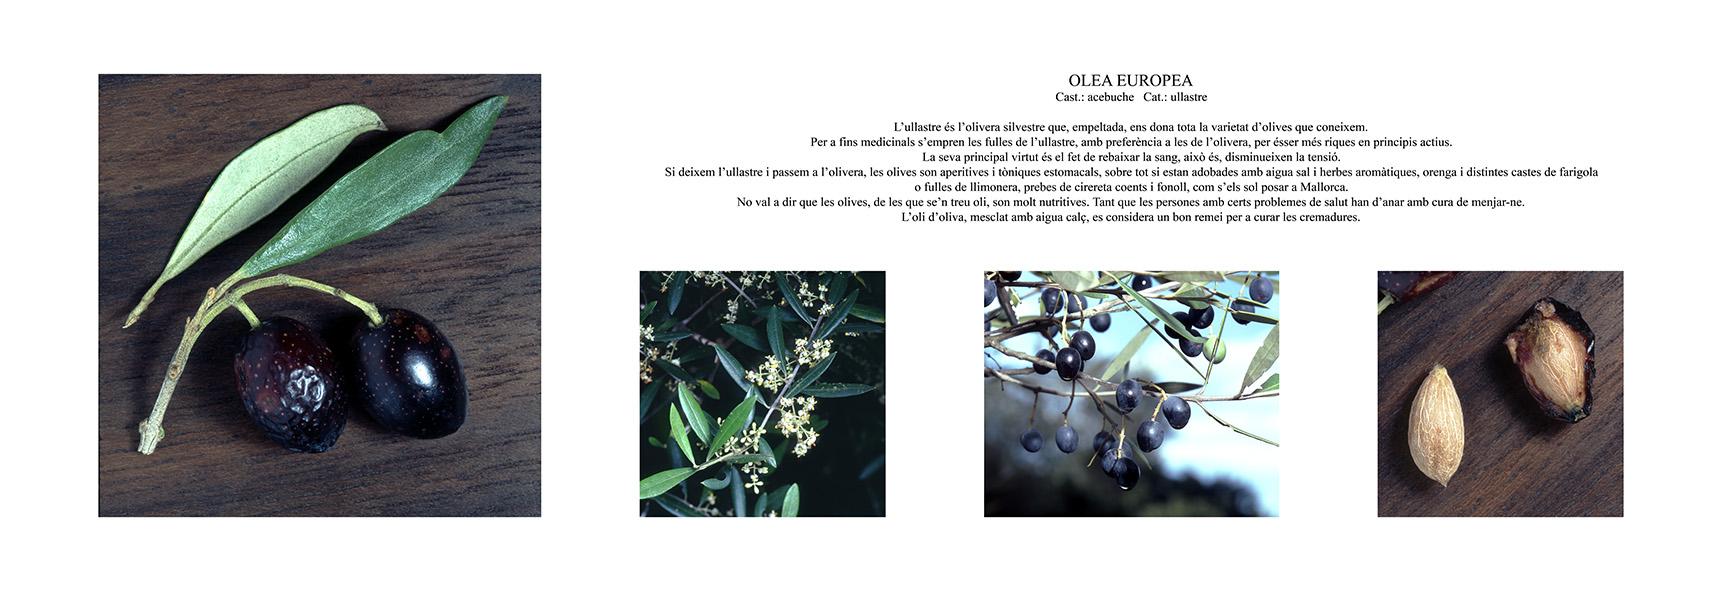 Pep Bonet Capellá-Botánica-Semillas-Macro fotografía (8)